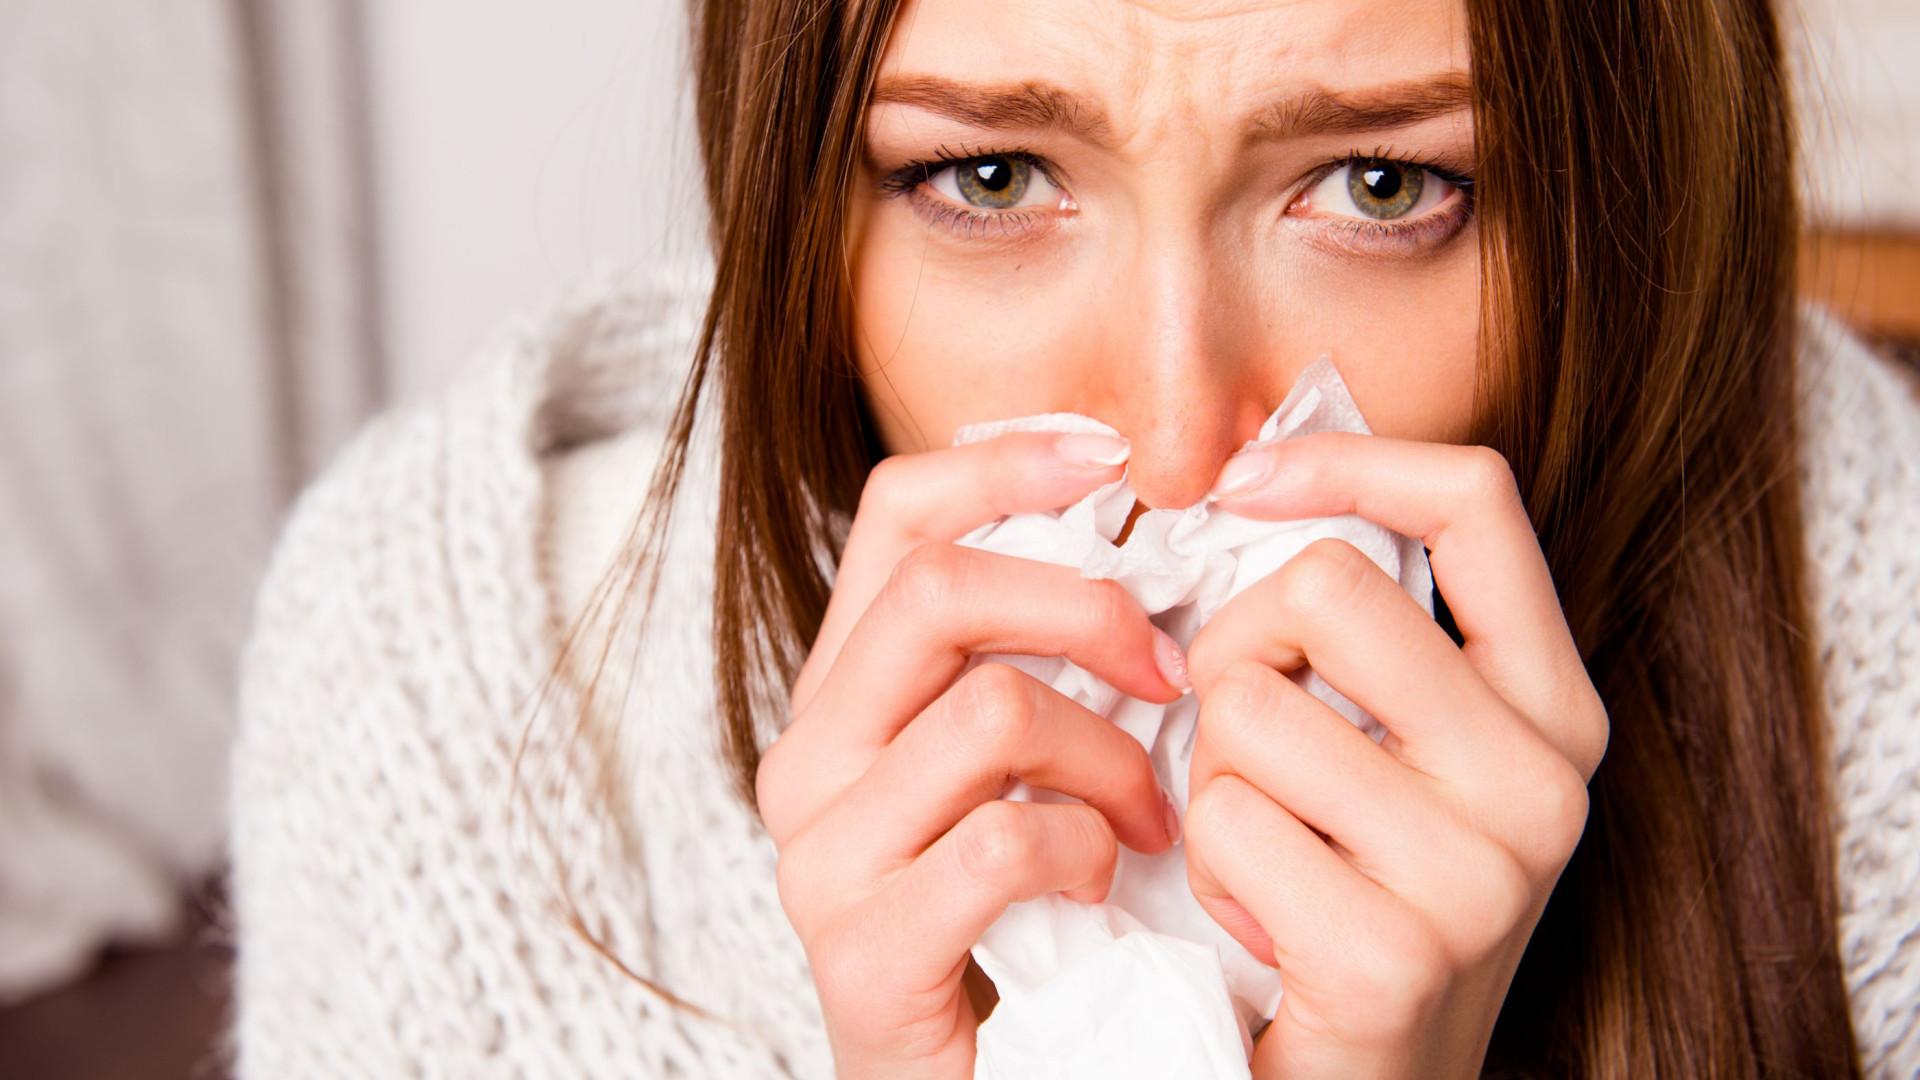 Descoberta nova molécula que promete curar a gripe (xô, espirros e tosse)